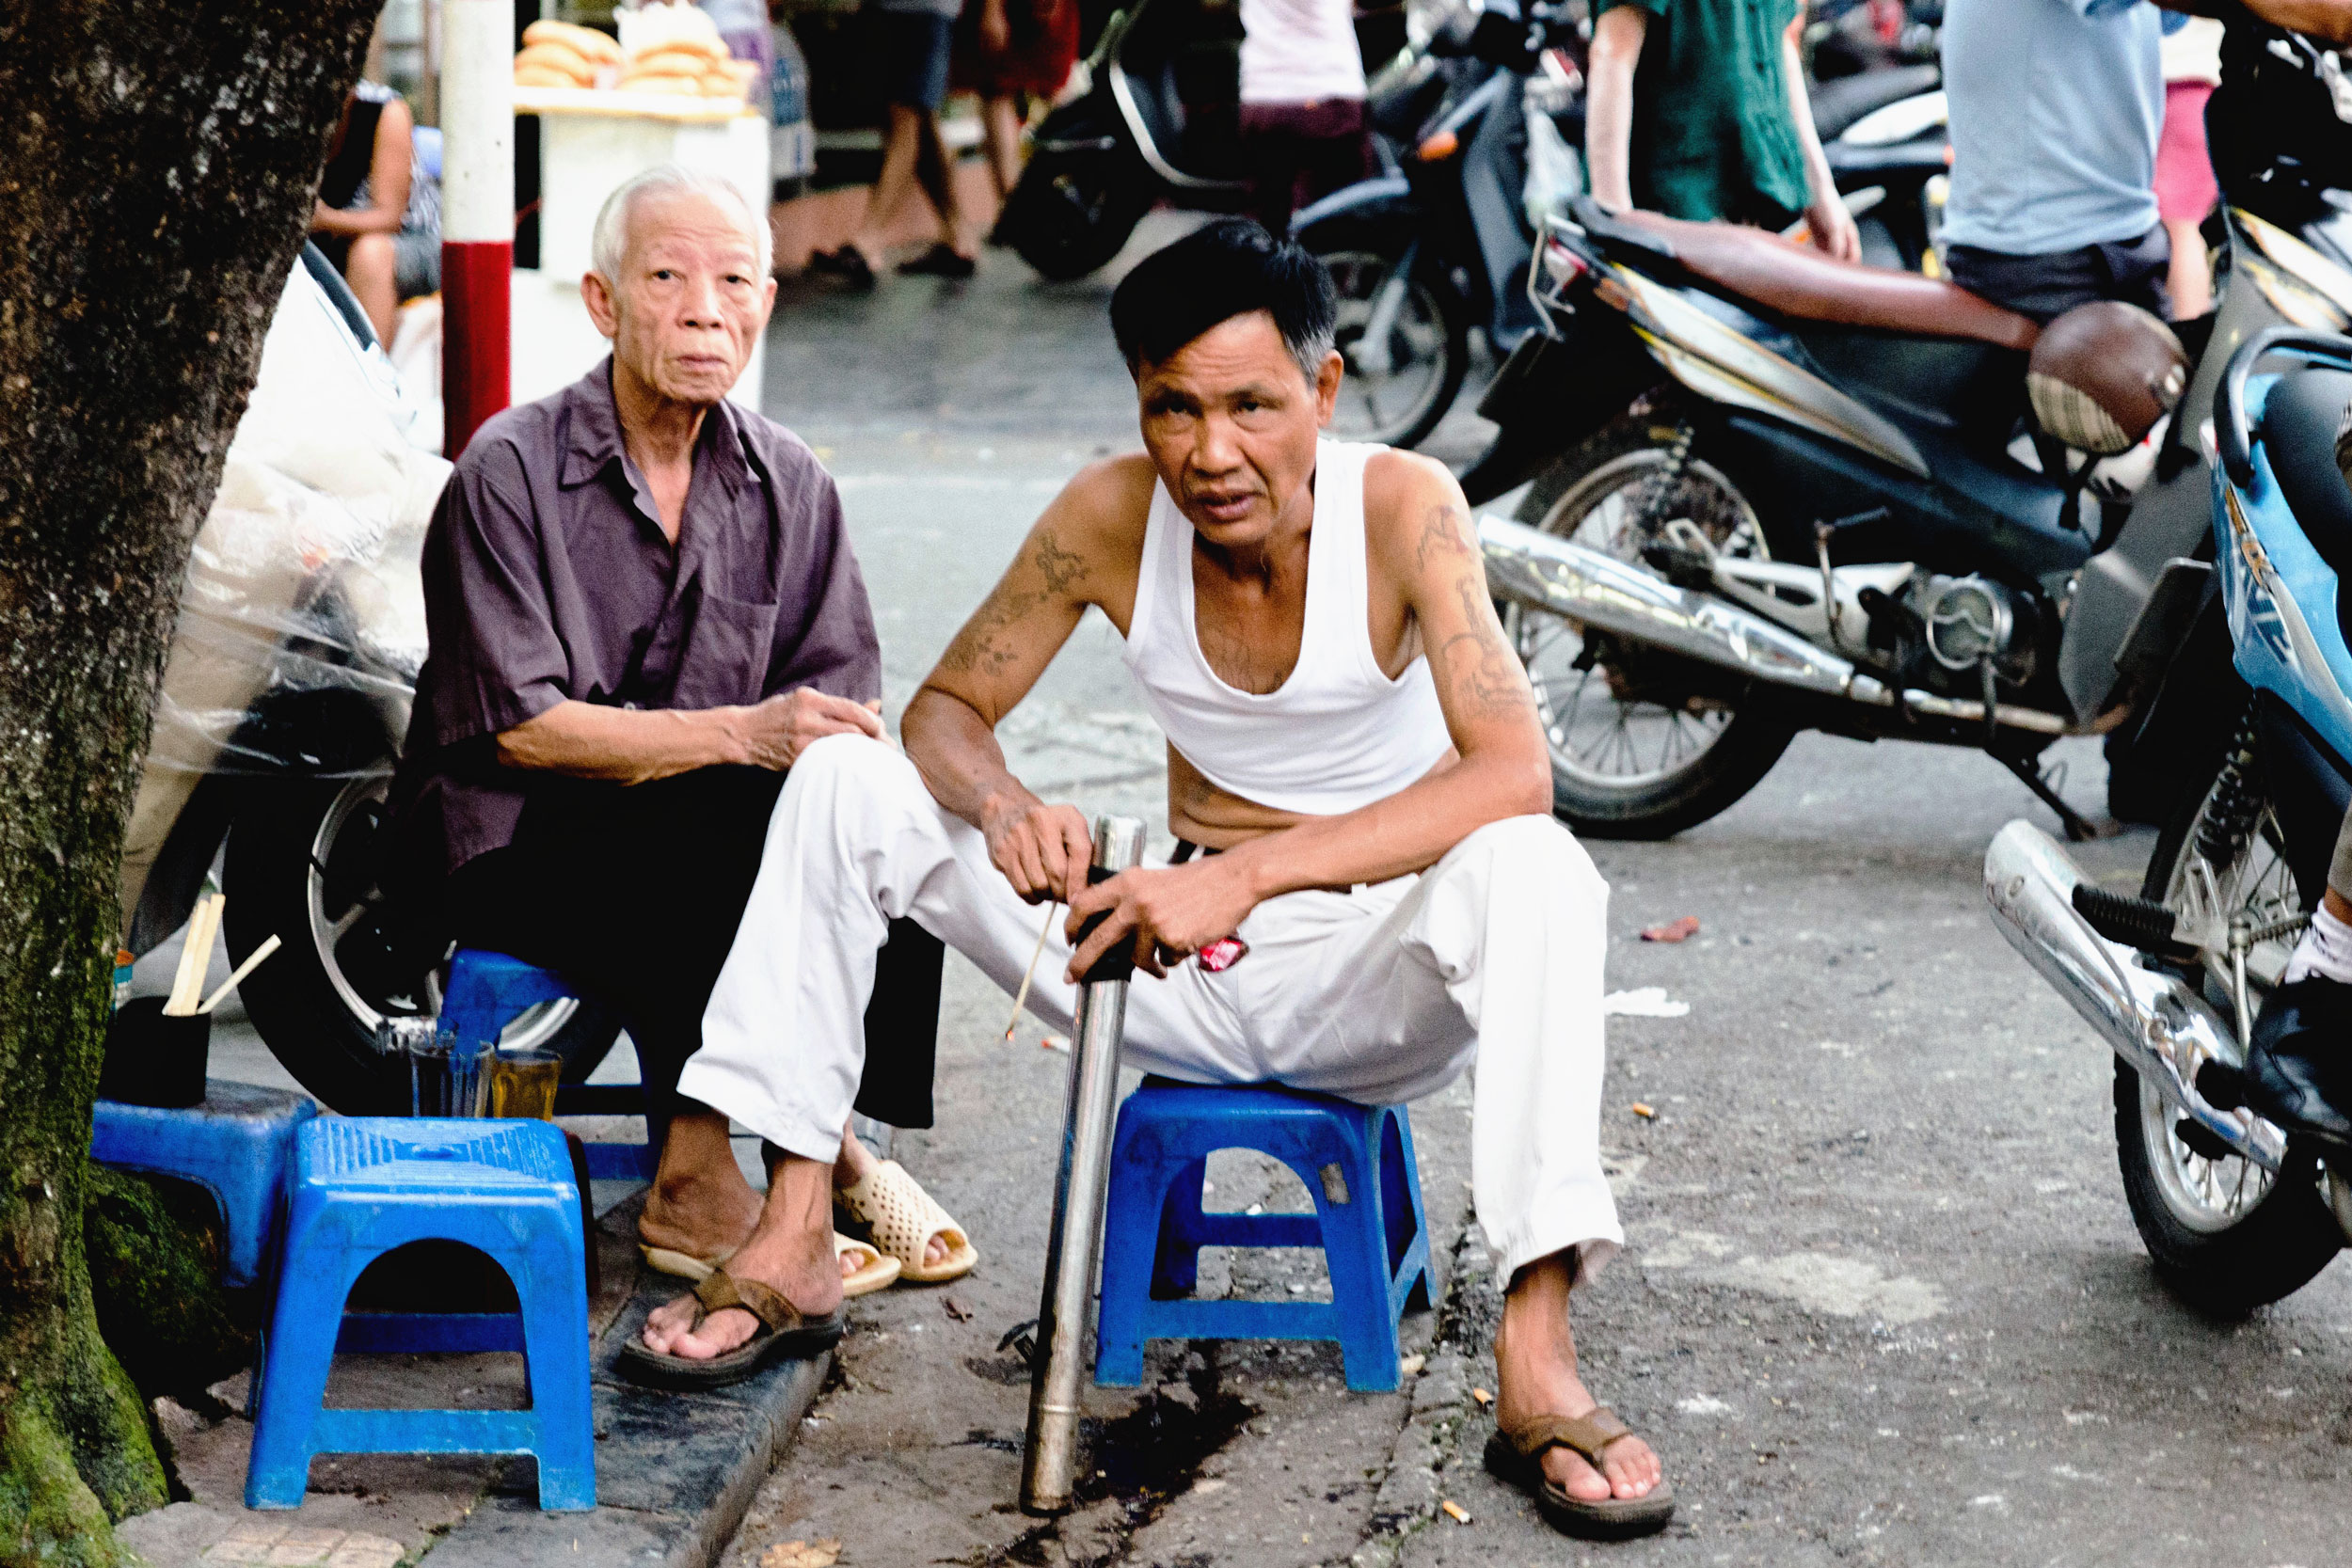 A man sitting on a curb in Hanoi